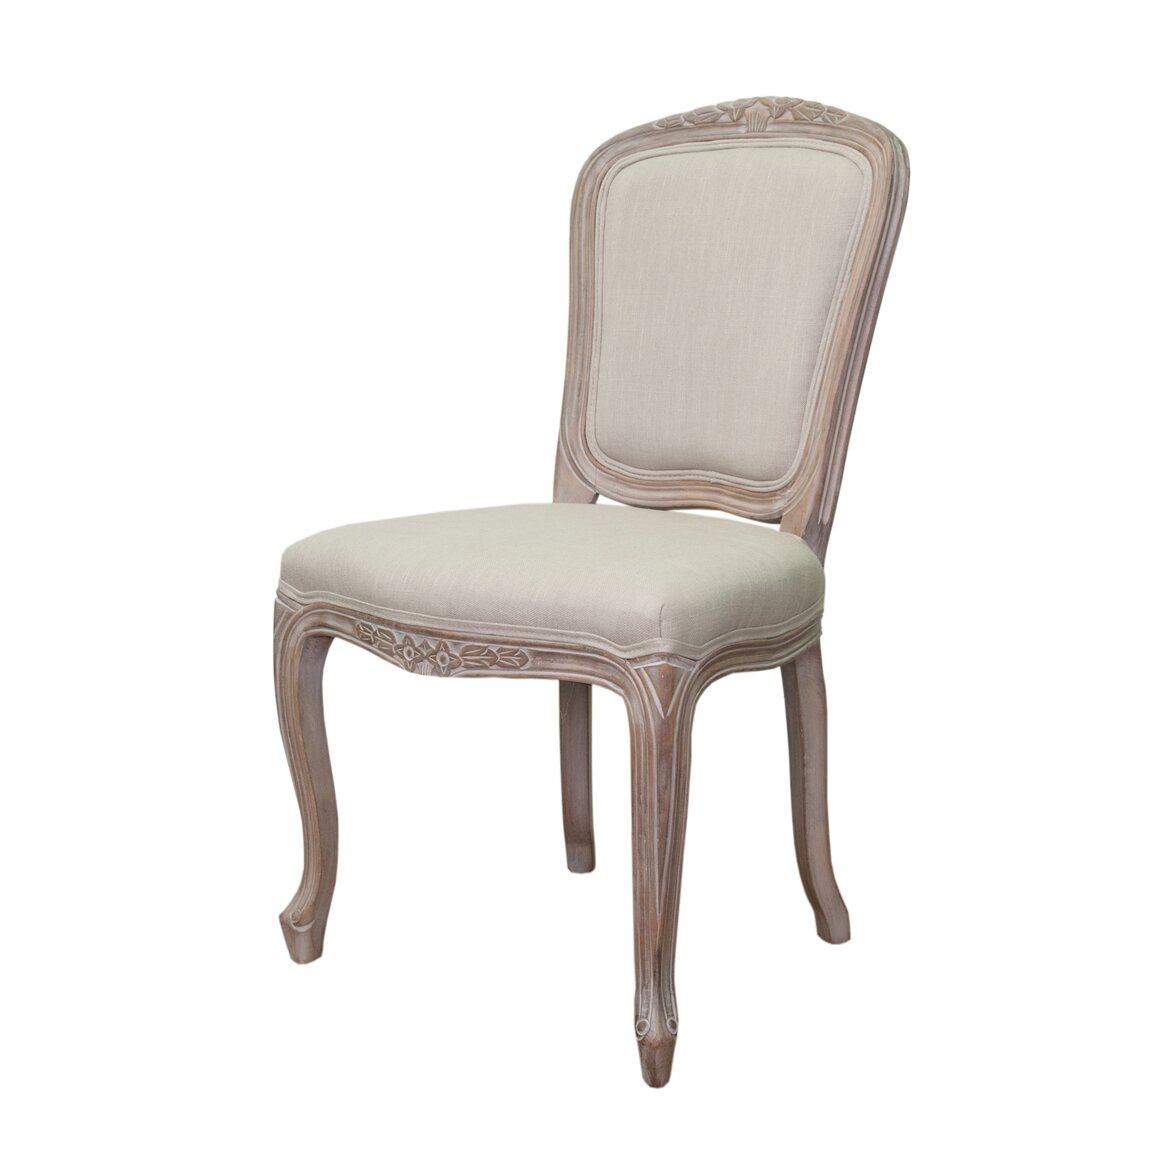 Стул Gran beige 4 | Обеденные стулья Kingsby